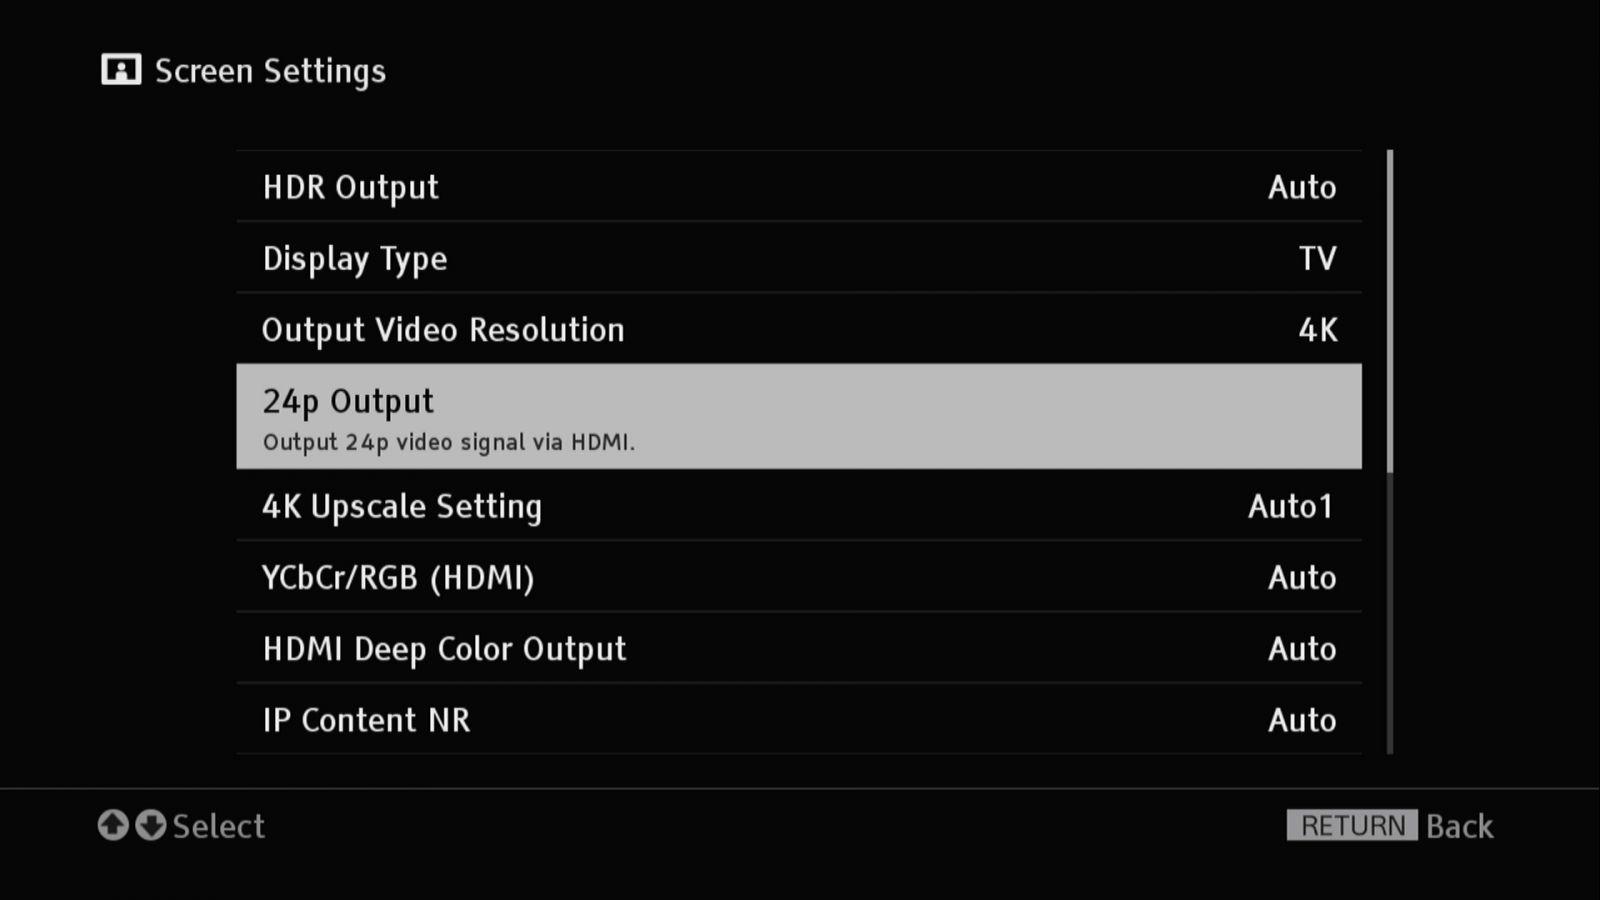 https://s1.occld.com/image/ca/kb/ca-1080f4kp_faqs_4k_passthrough_screen_settings_24p_output.jpg